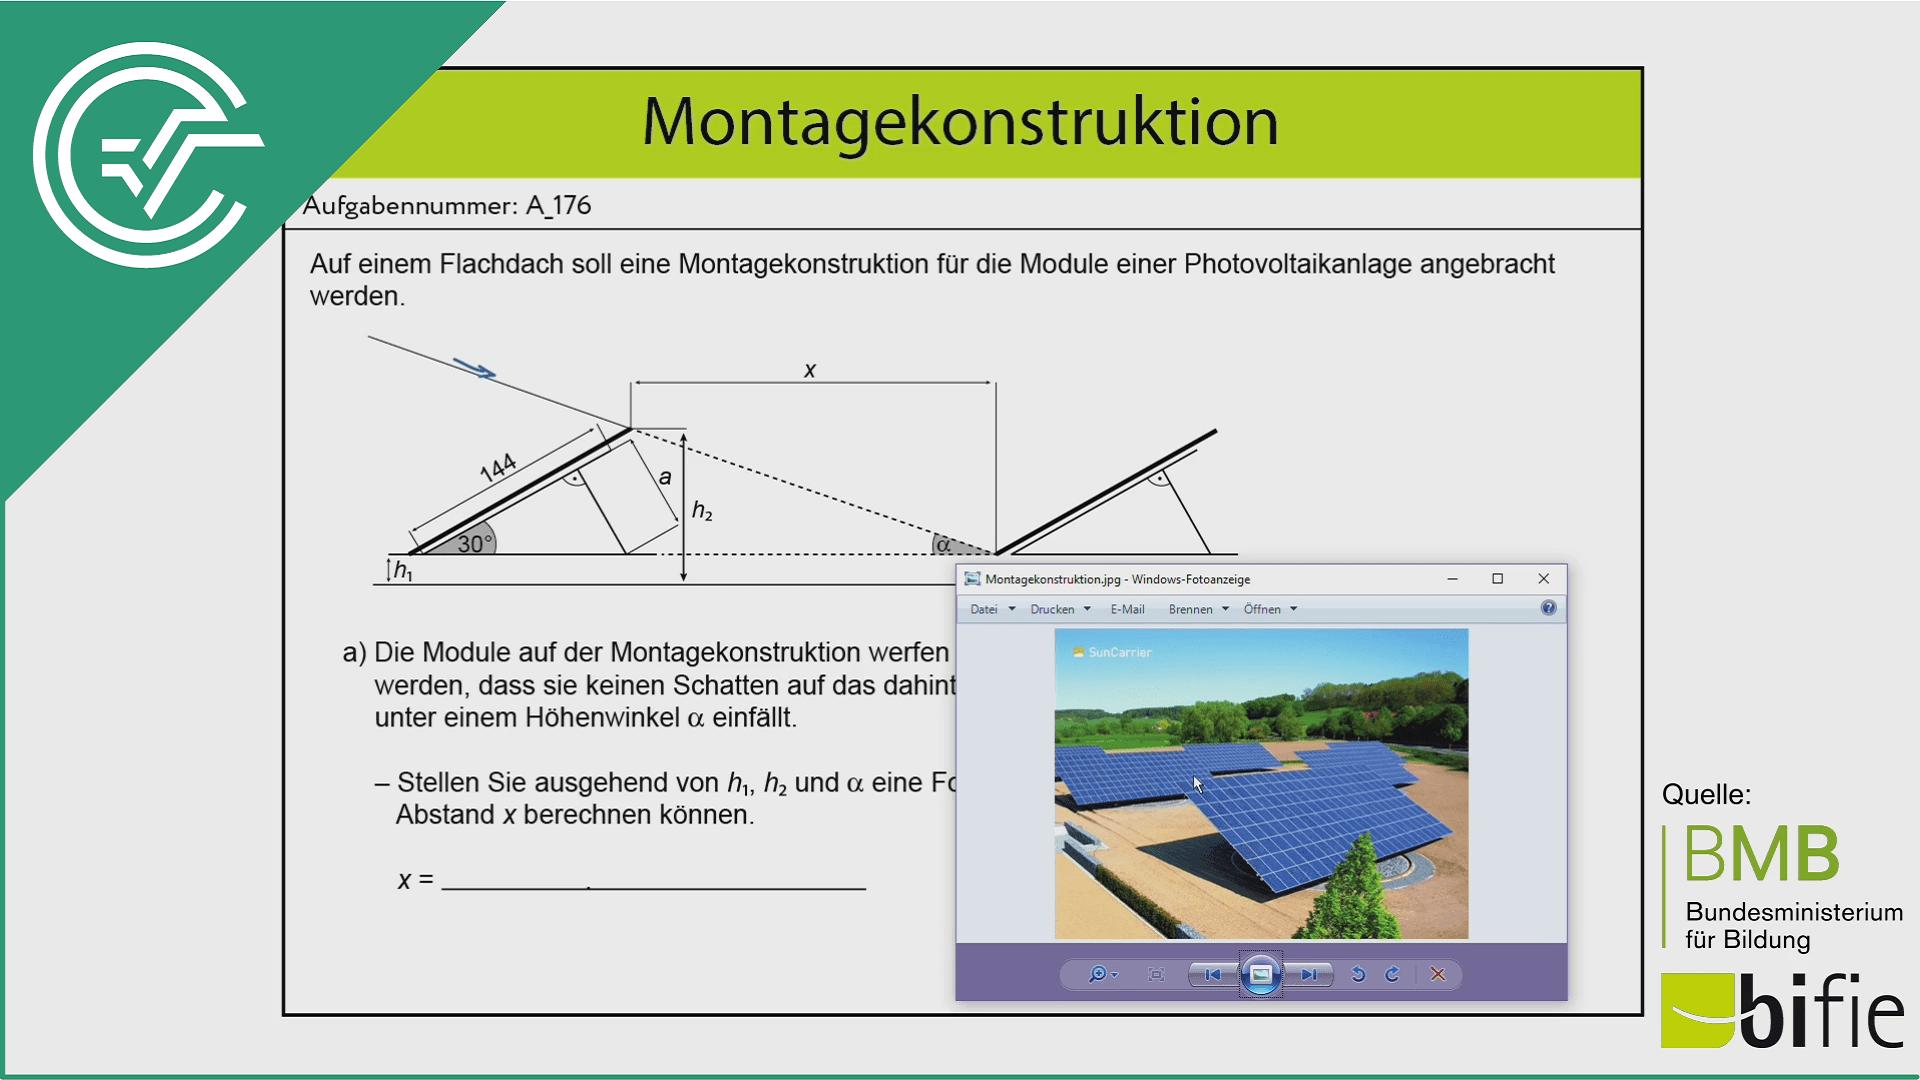 A_176 Montagekonstruktion a [Trigonometrie]